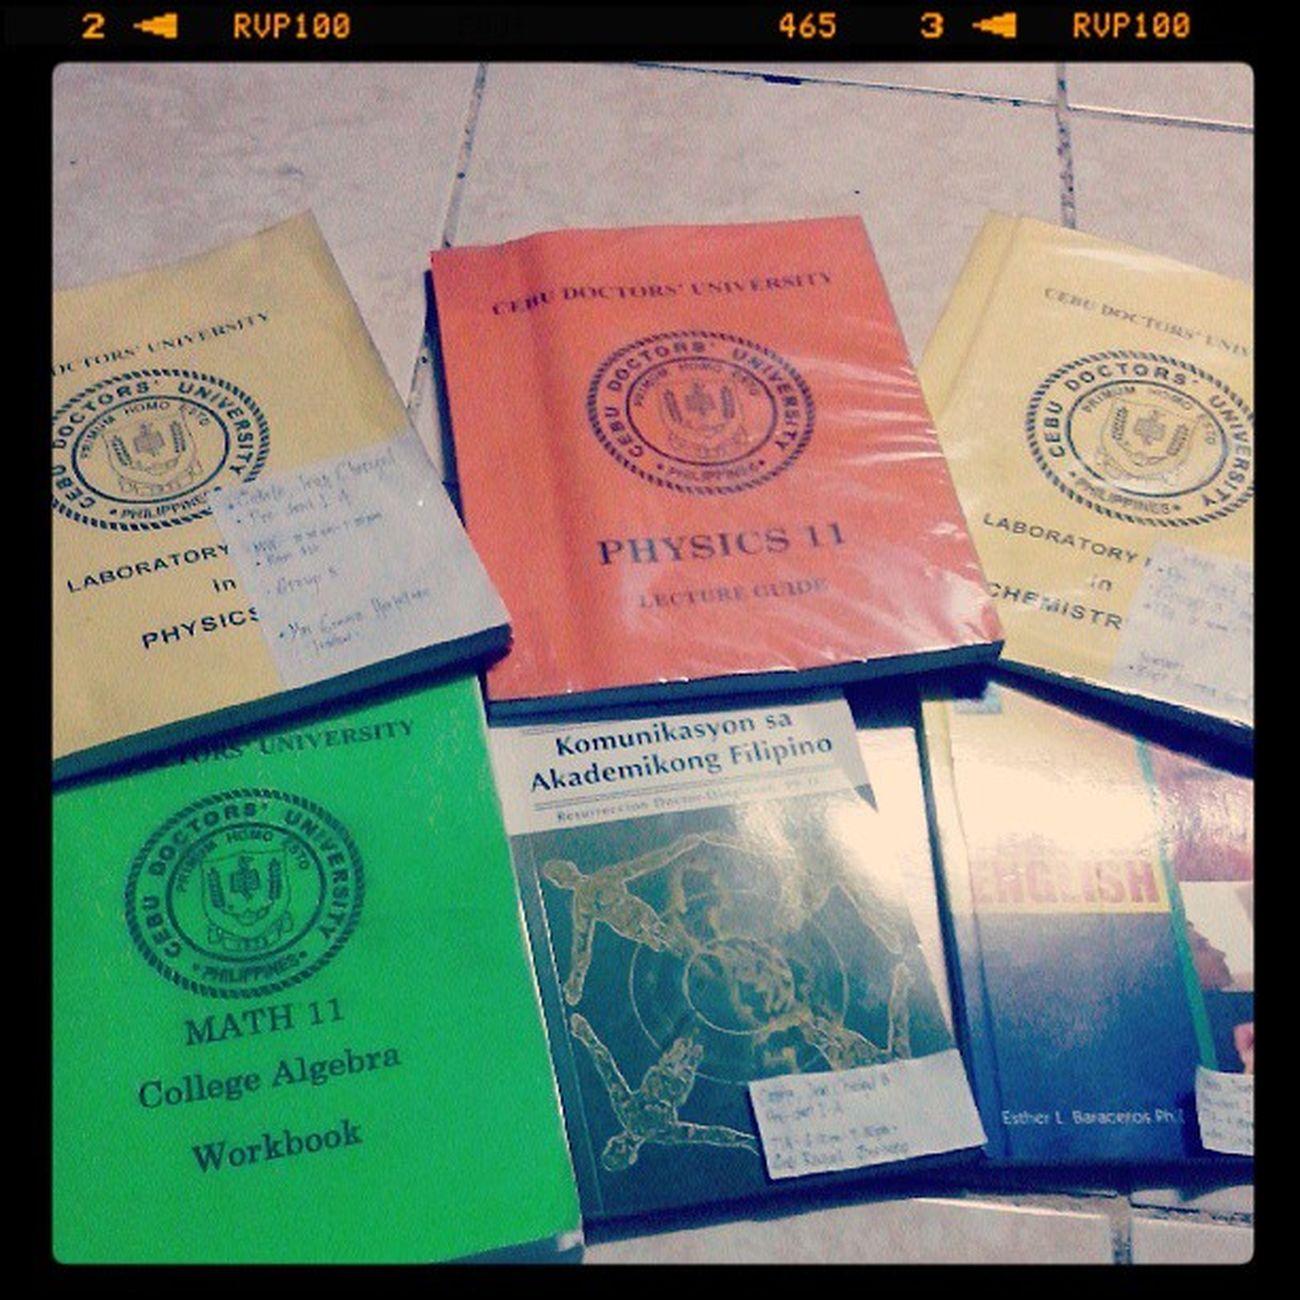 My books for the 1st Semester. Its not yet complete, Lol. It sucks! Daghan kaayo :'( LaboratoryinPhysics LectureGuideinPhysics LaboratoryinChemistry CollegeAlgebra KomunikasyonsaAkademikongFilipino IntroductiontoCollegeEnglish tabangi ko ug dala. Lol ;)